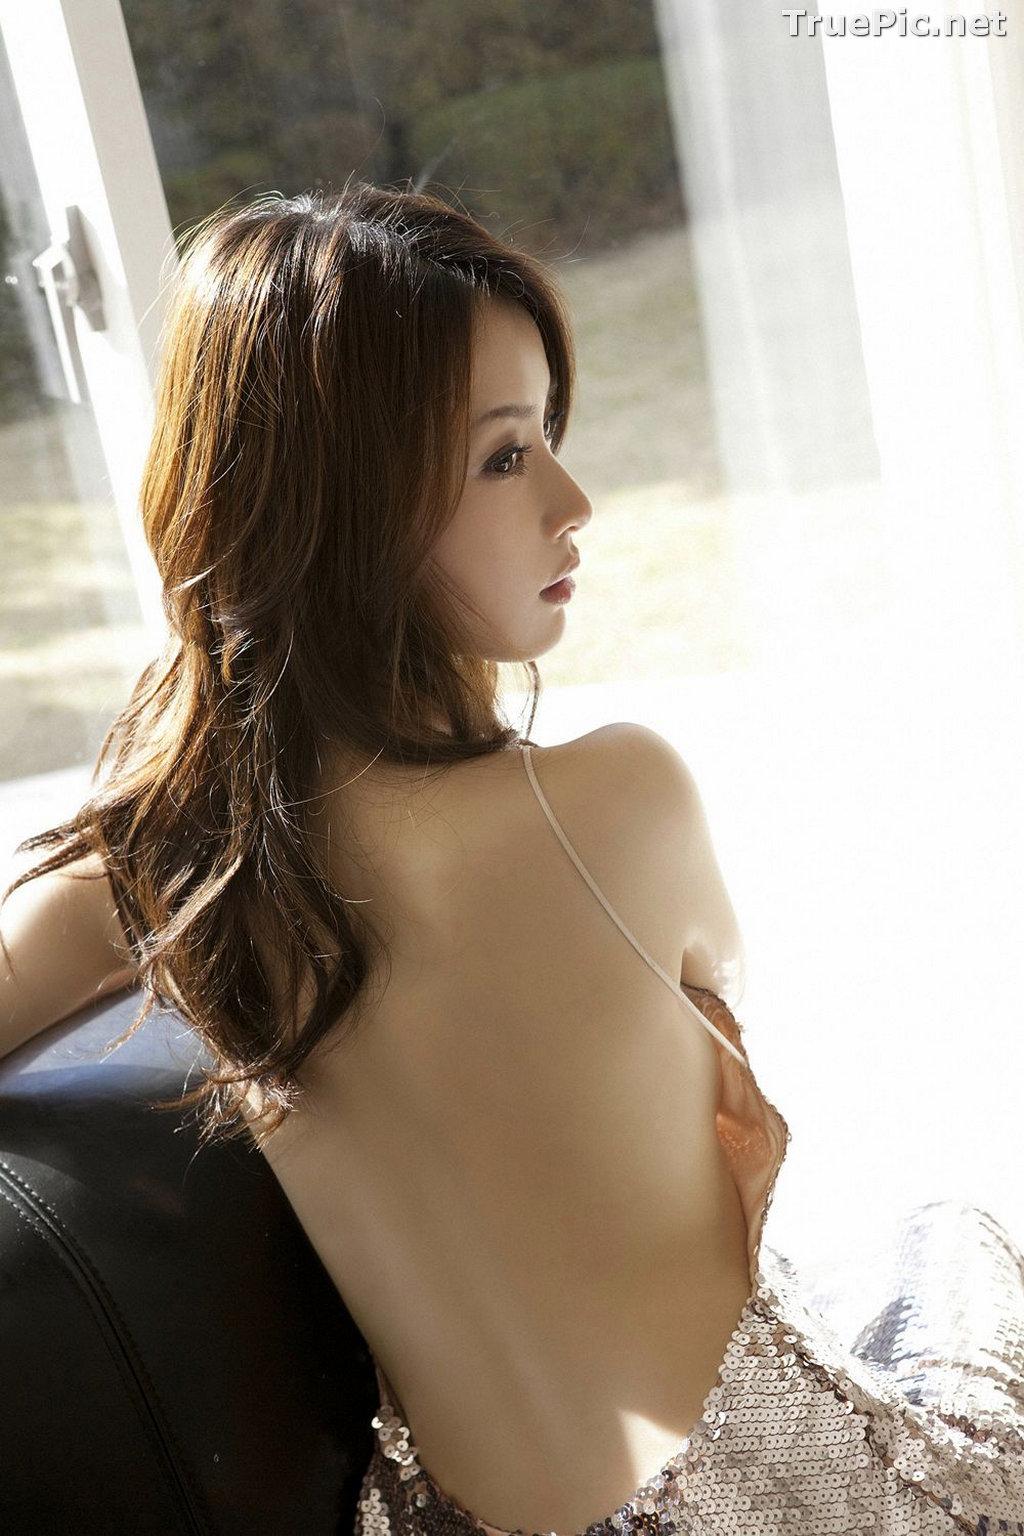 Image [YS Web] Vol.340 - Japanese Model and Actress - Saki Seto - TruePic.net - Picture-5